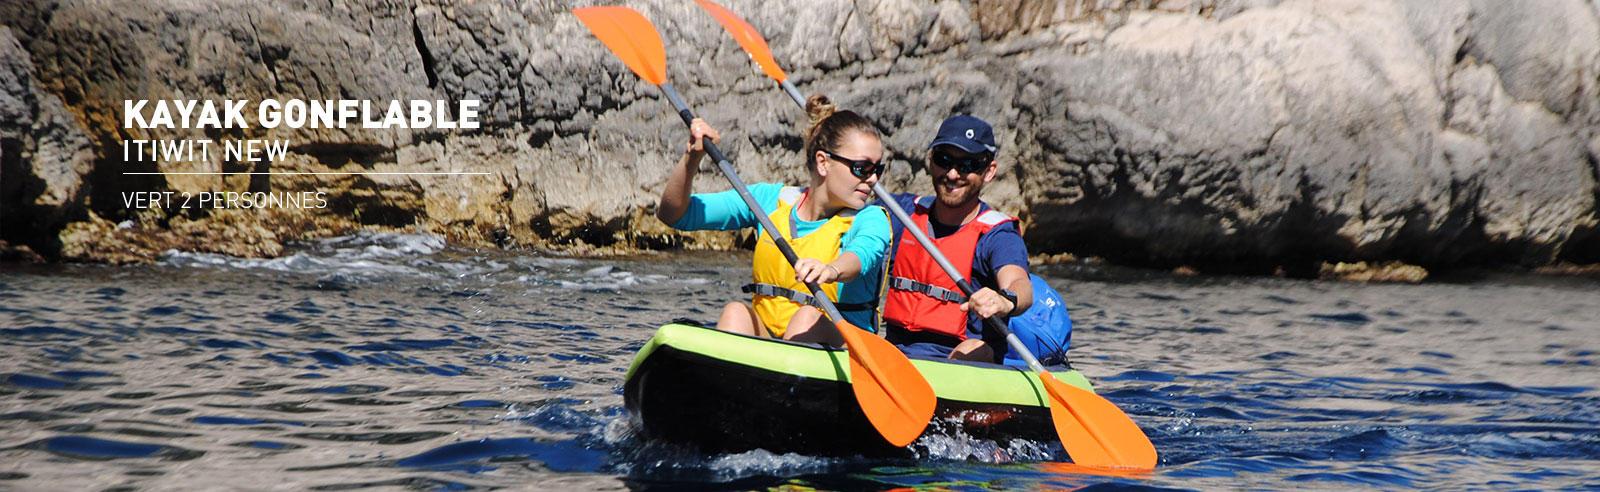 kayak-gonflable-itiwit-vert-2-personnes-itiwit-decathlon-v2